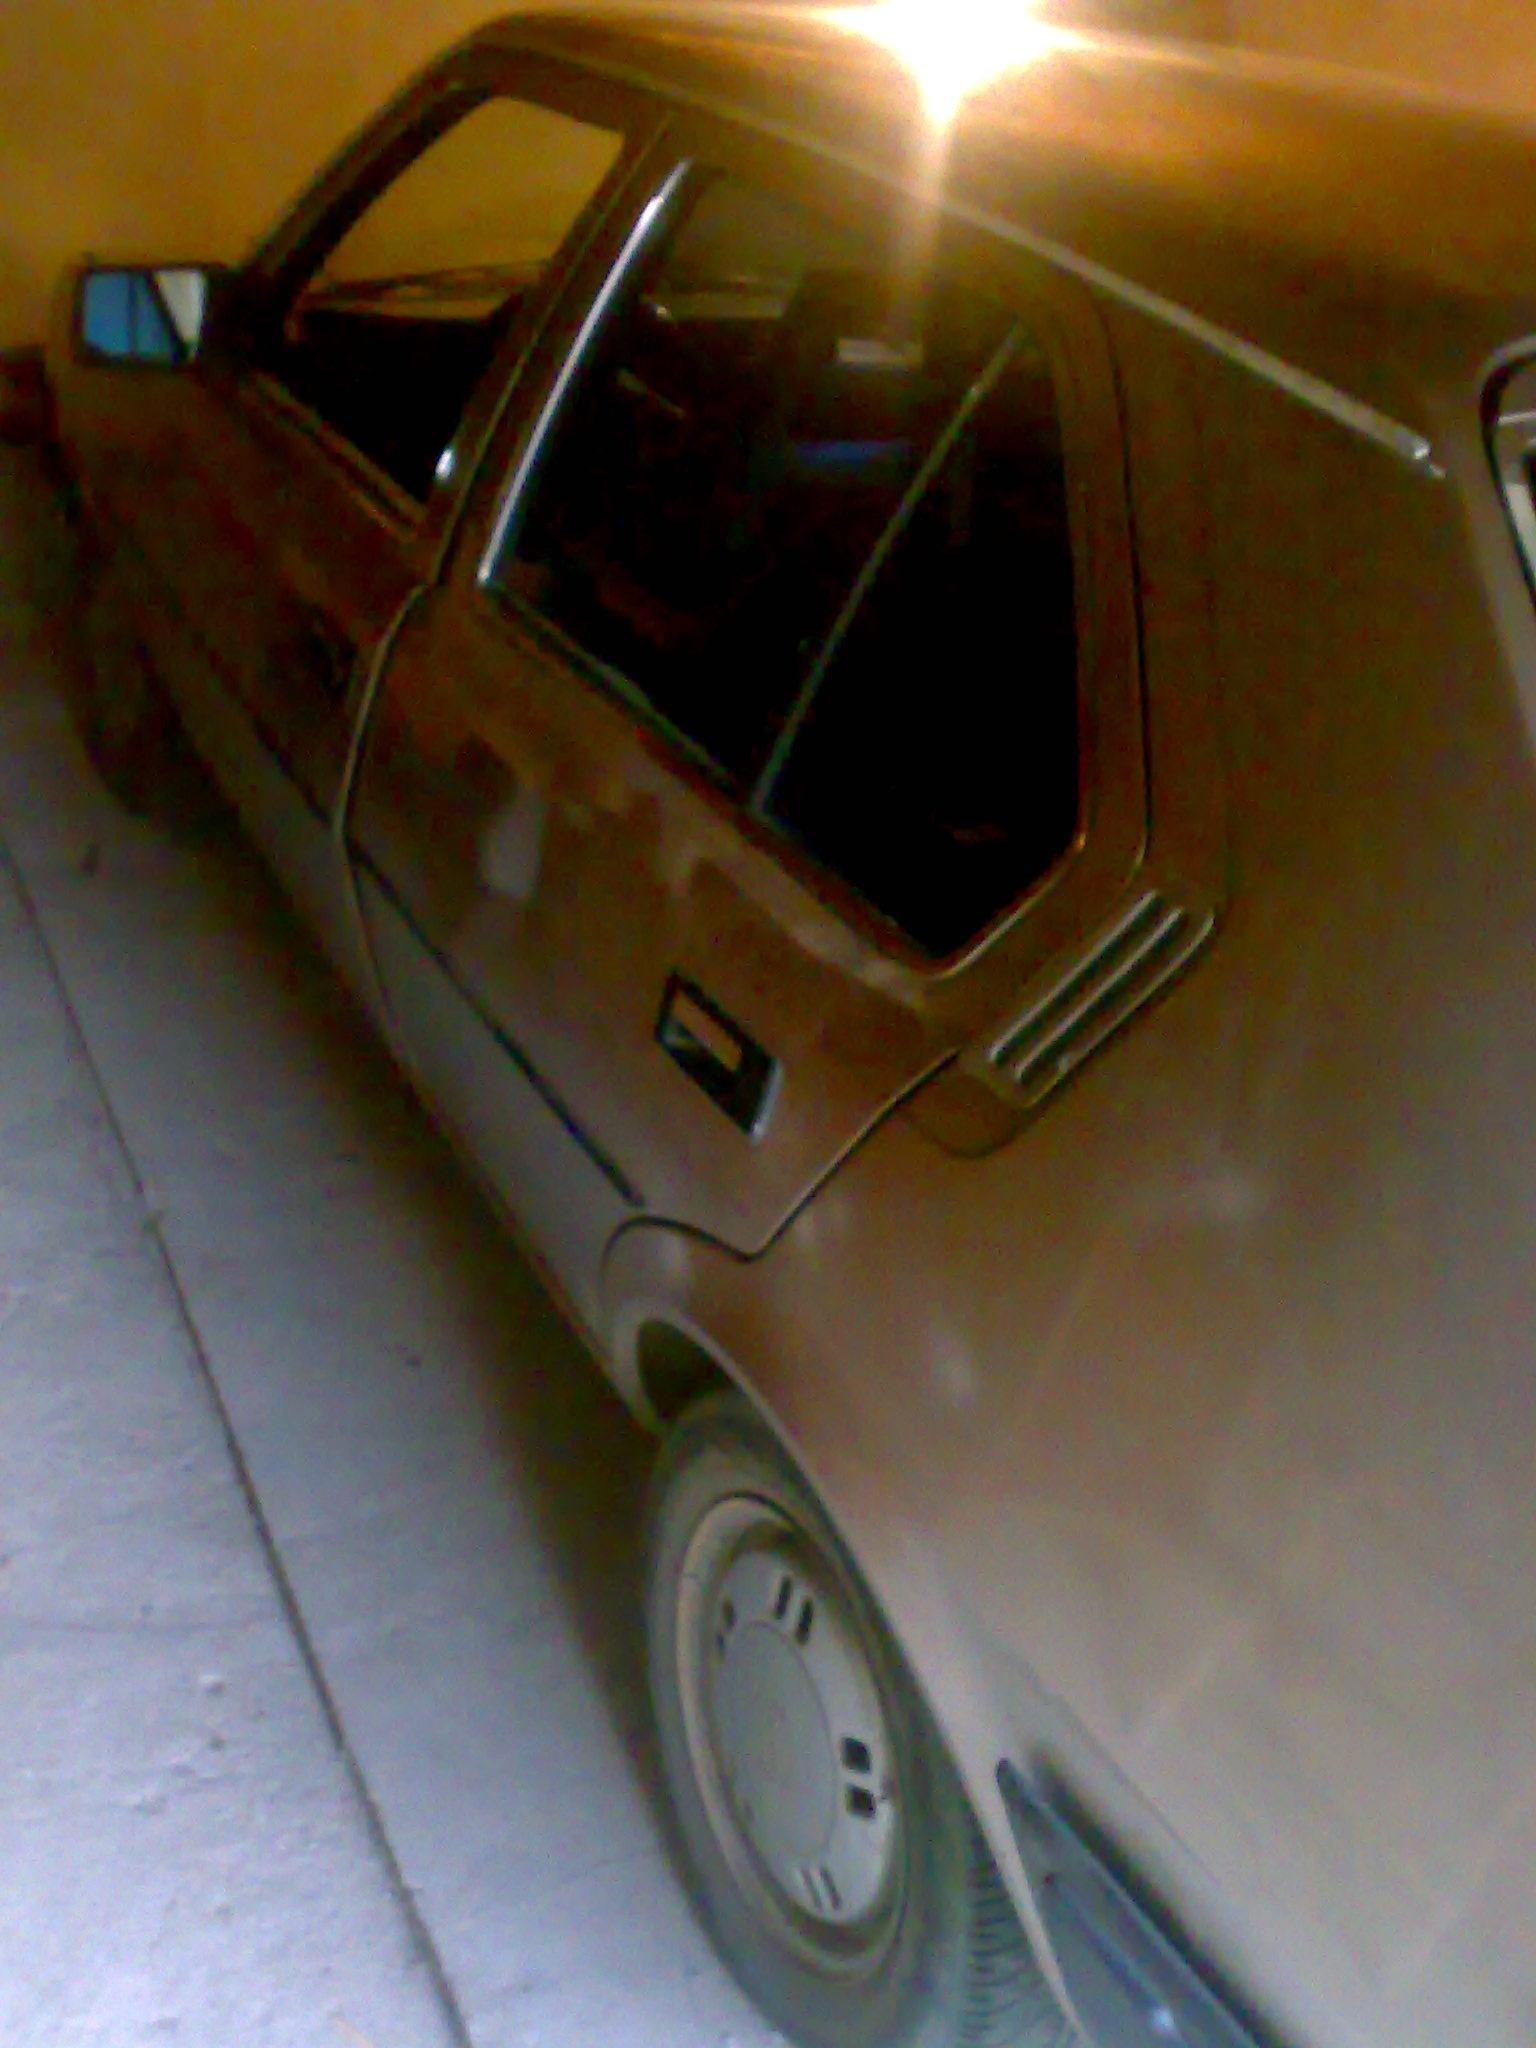 Осматривал машину на выходных: https://www.drive2.ru/l/4899916394579112280/